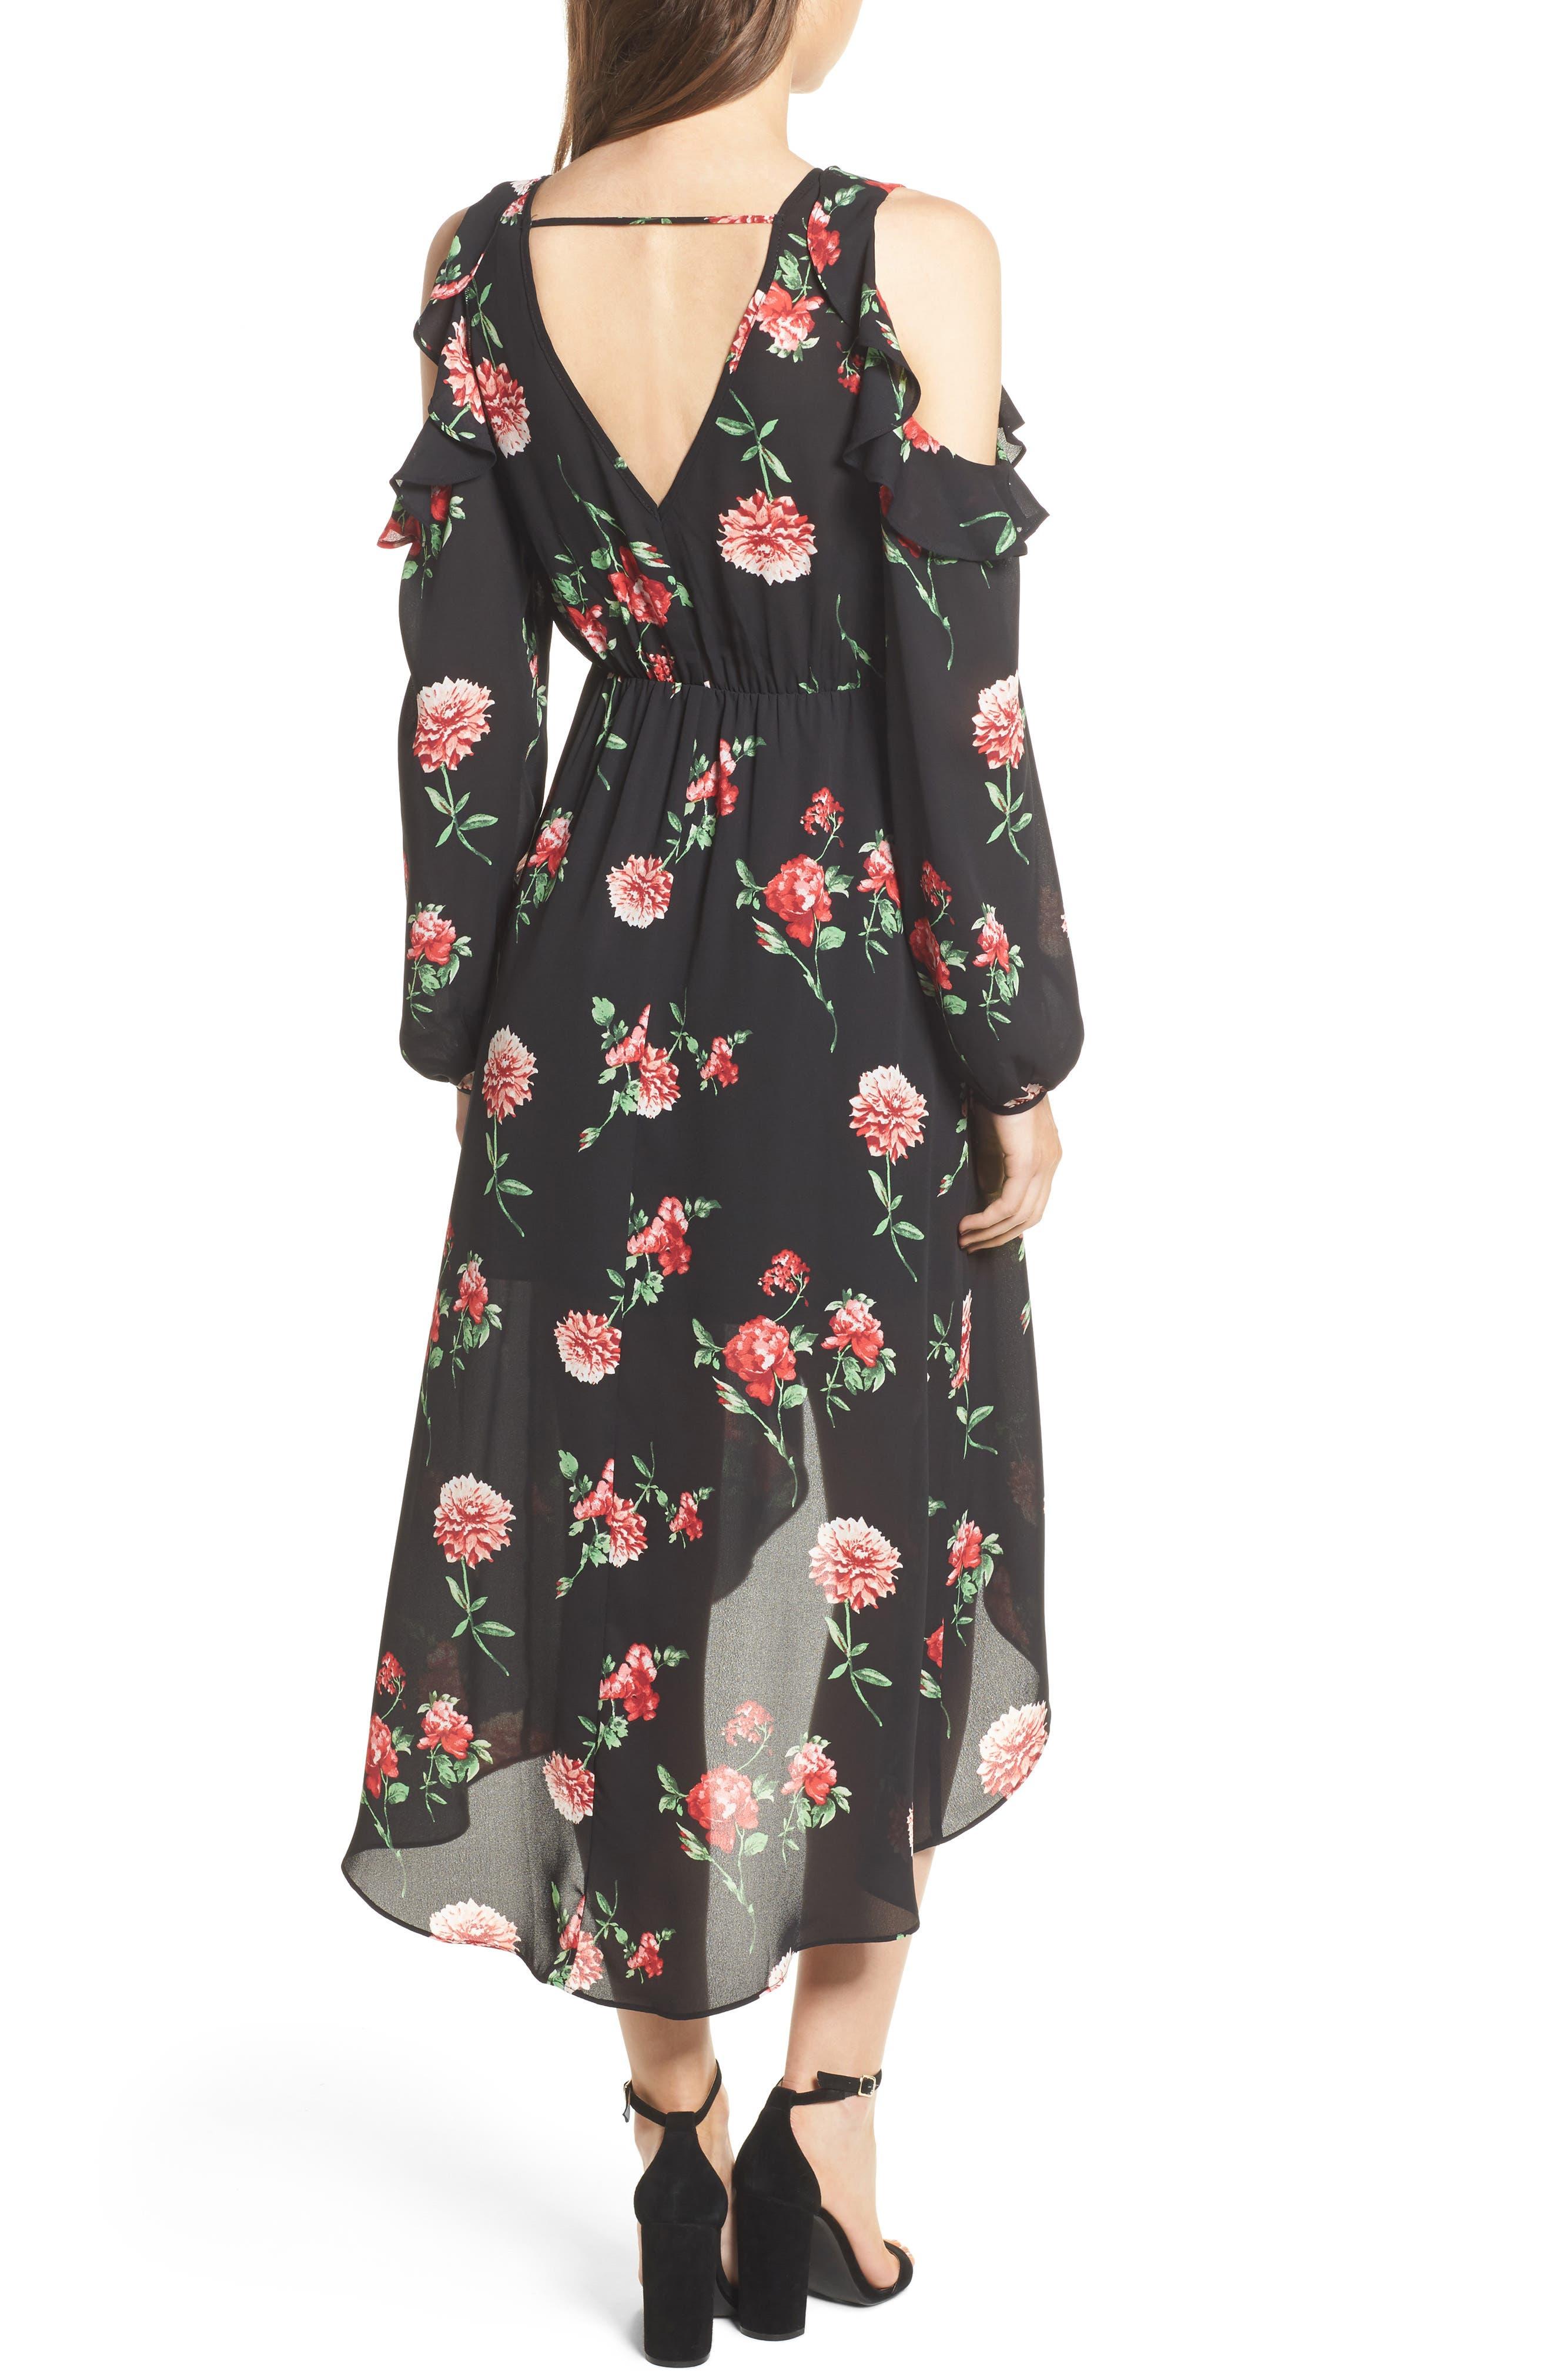 Ruffle Cold Shoulder Faux Wrap Dress,                             Alternate thumbnail 2, color,                             750 Black Red